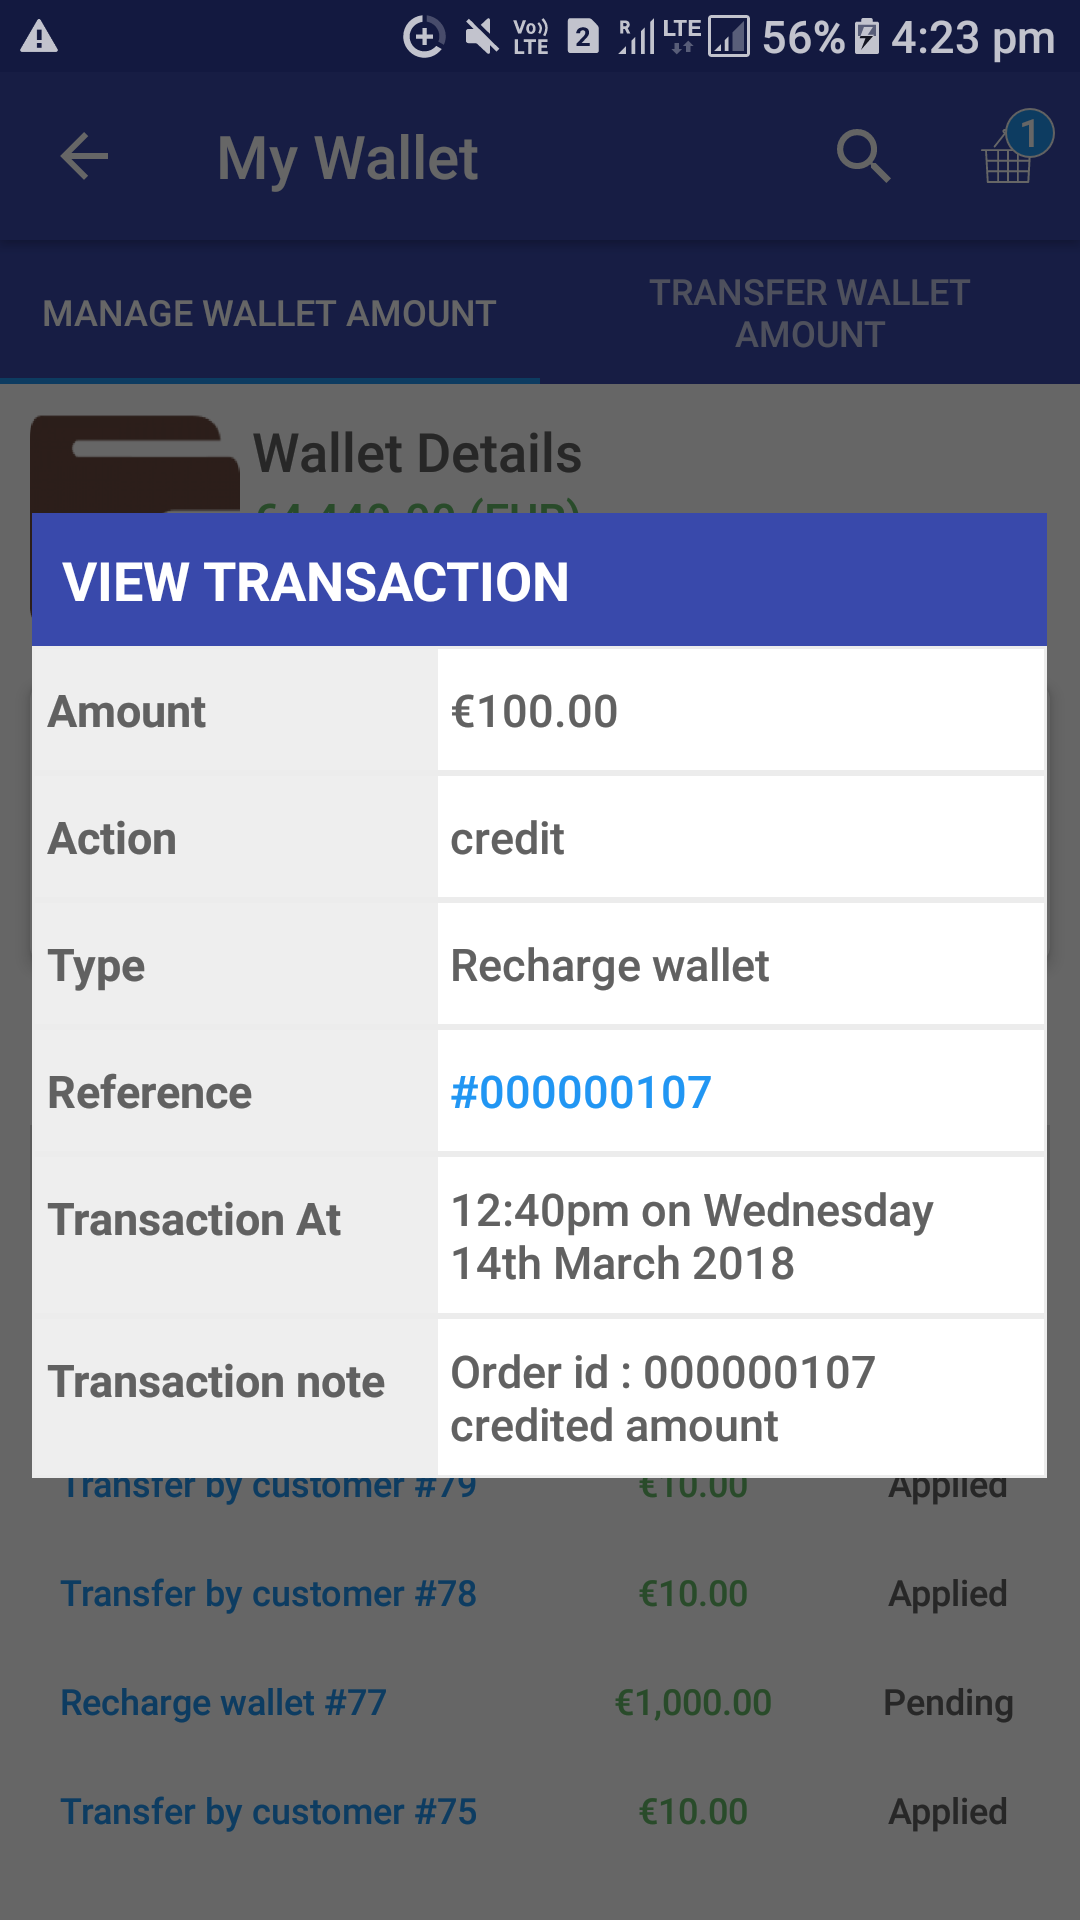 Opencart Mobikul Wallet - View Transaction Details